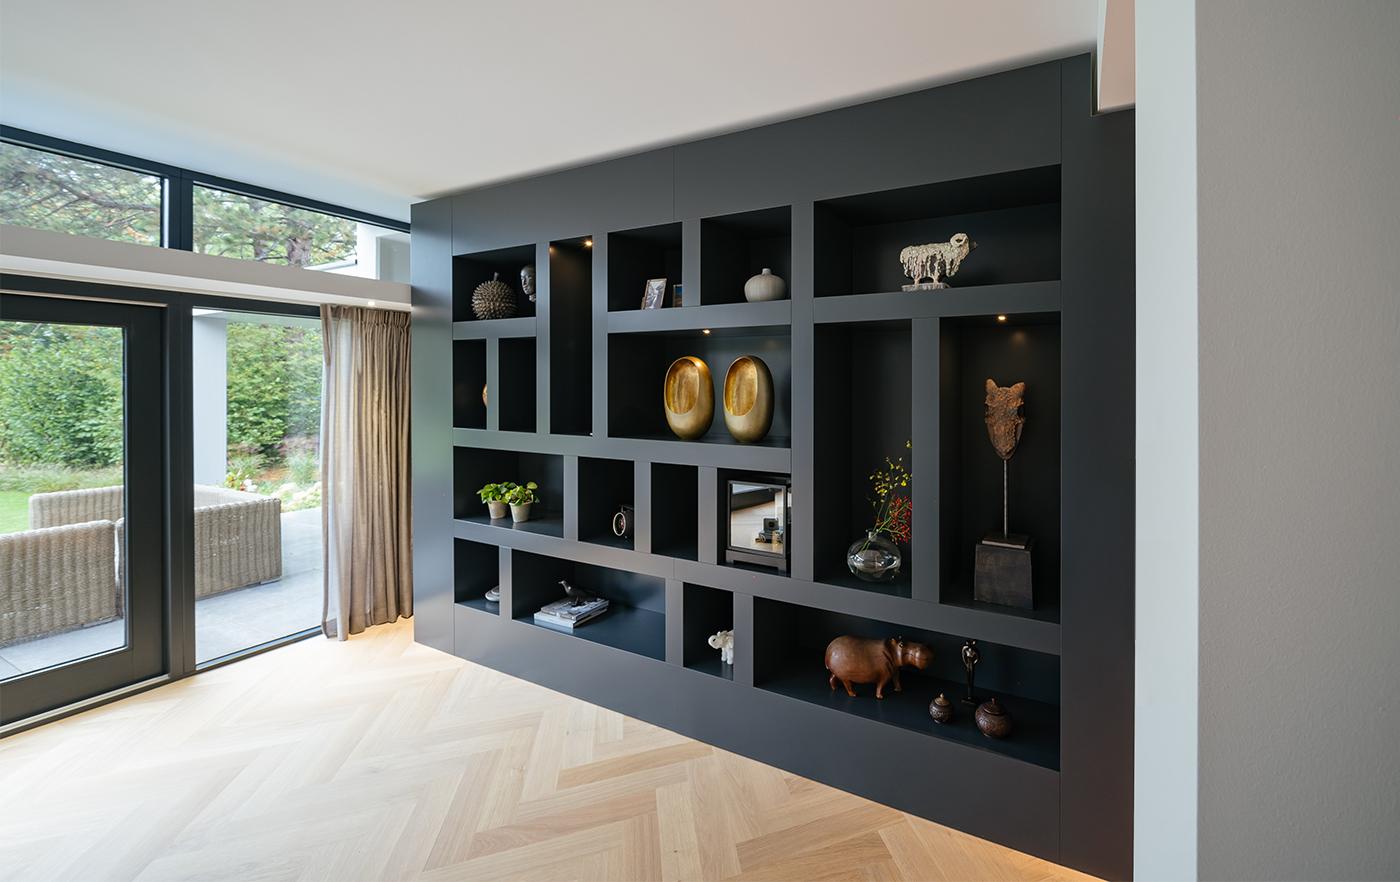 interieurarchitect_mira_ontwerp_interieur_stalendeuren_nieuwegein_woonkamer_kast_vakkenkast_visie